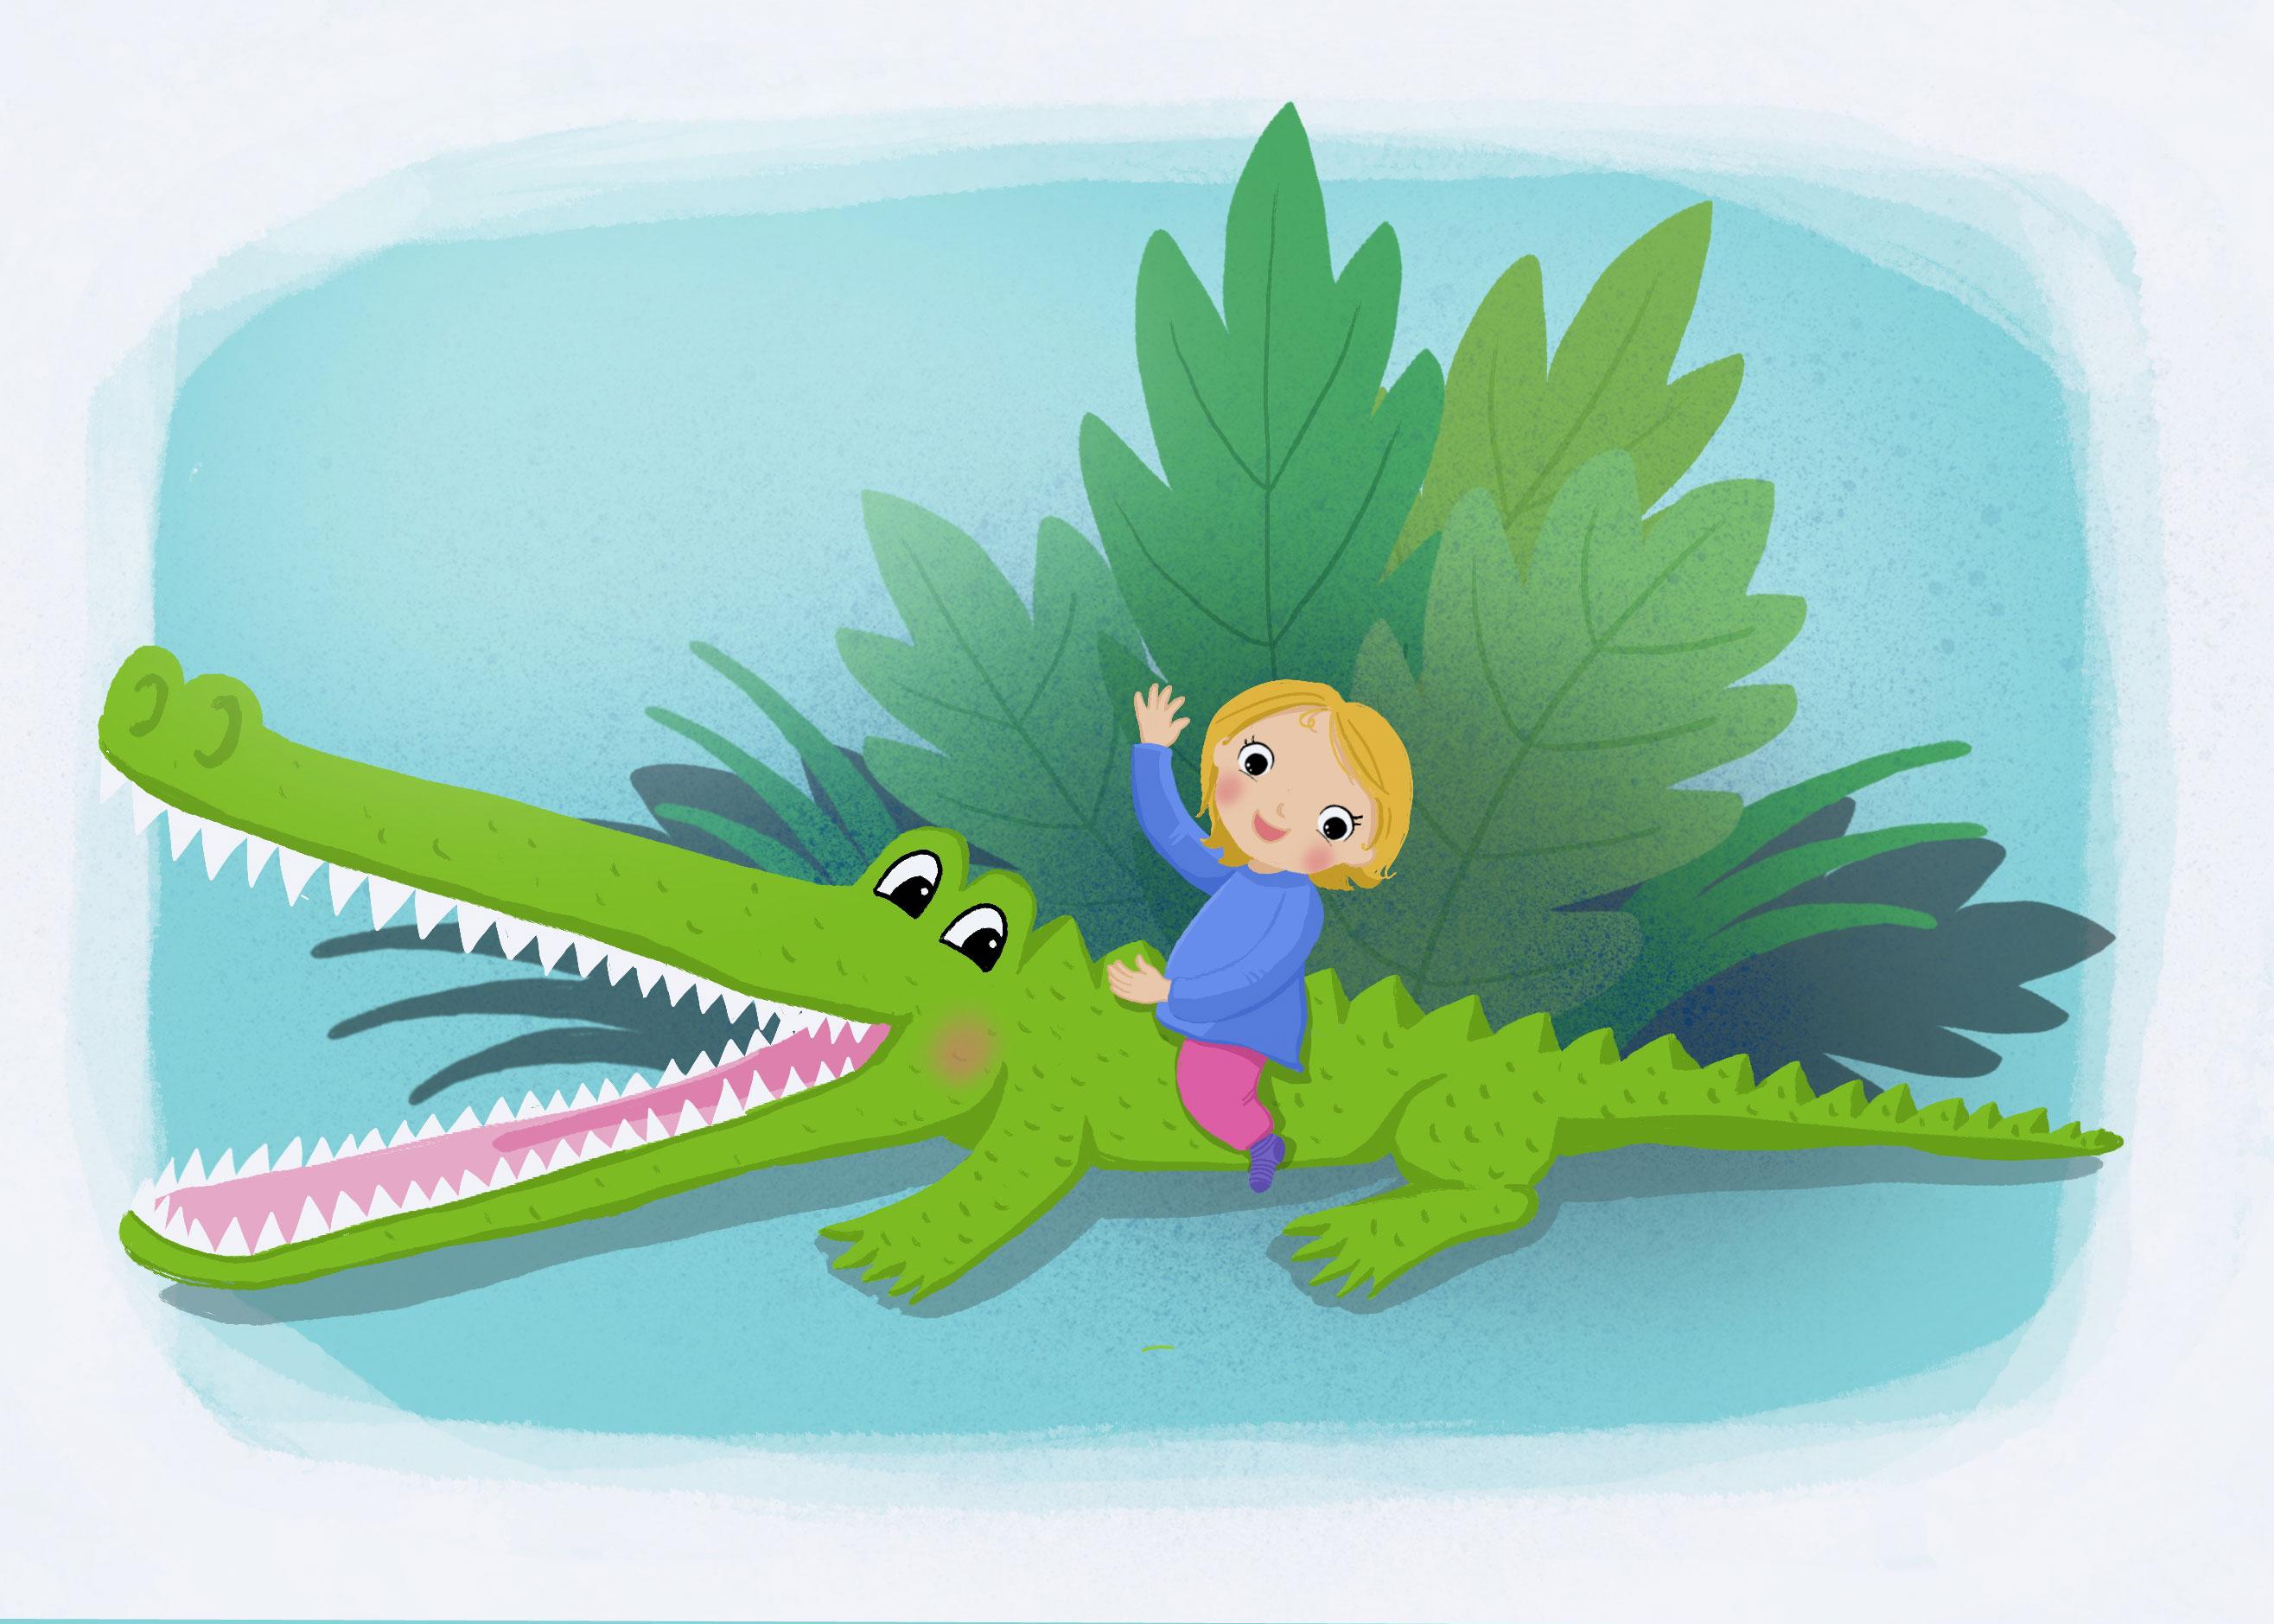 Krokodil, Mädchen, Kinder, Illustration